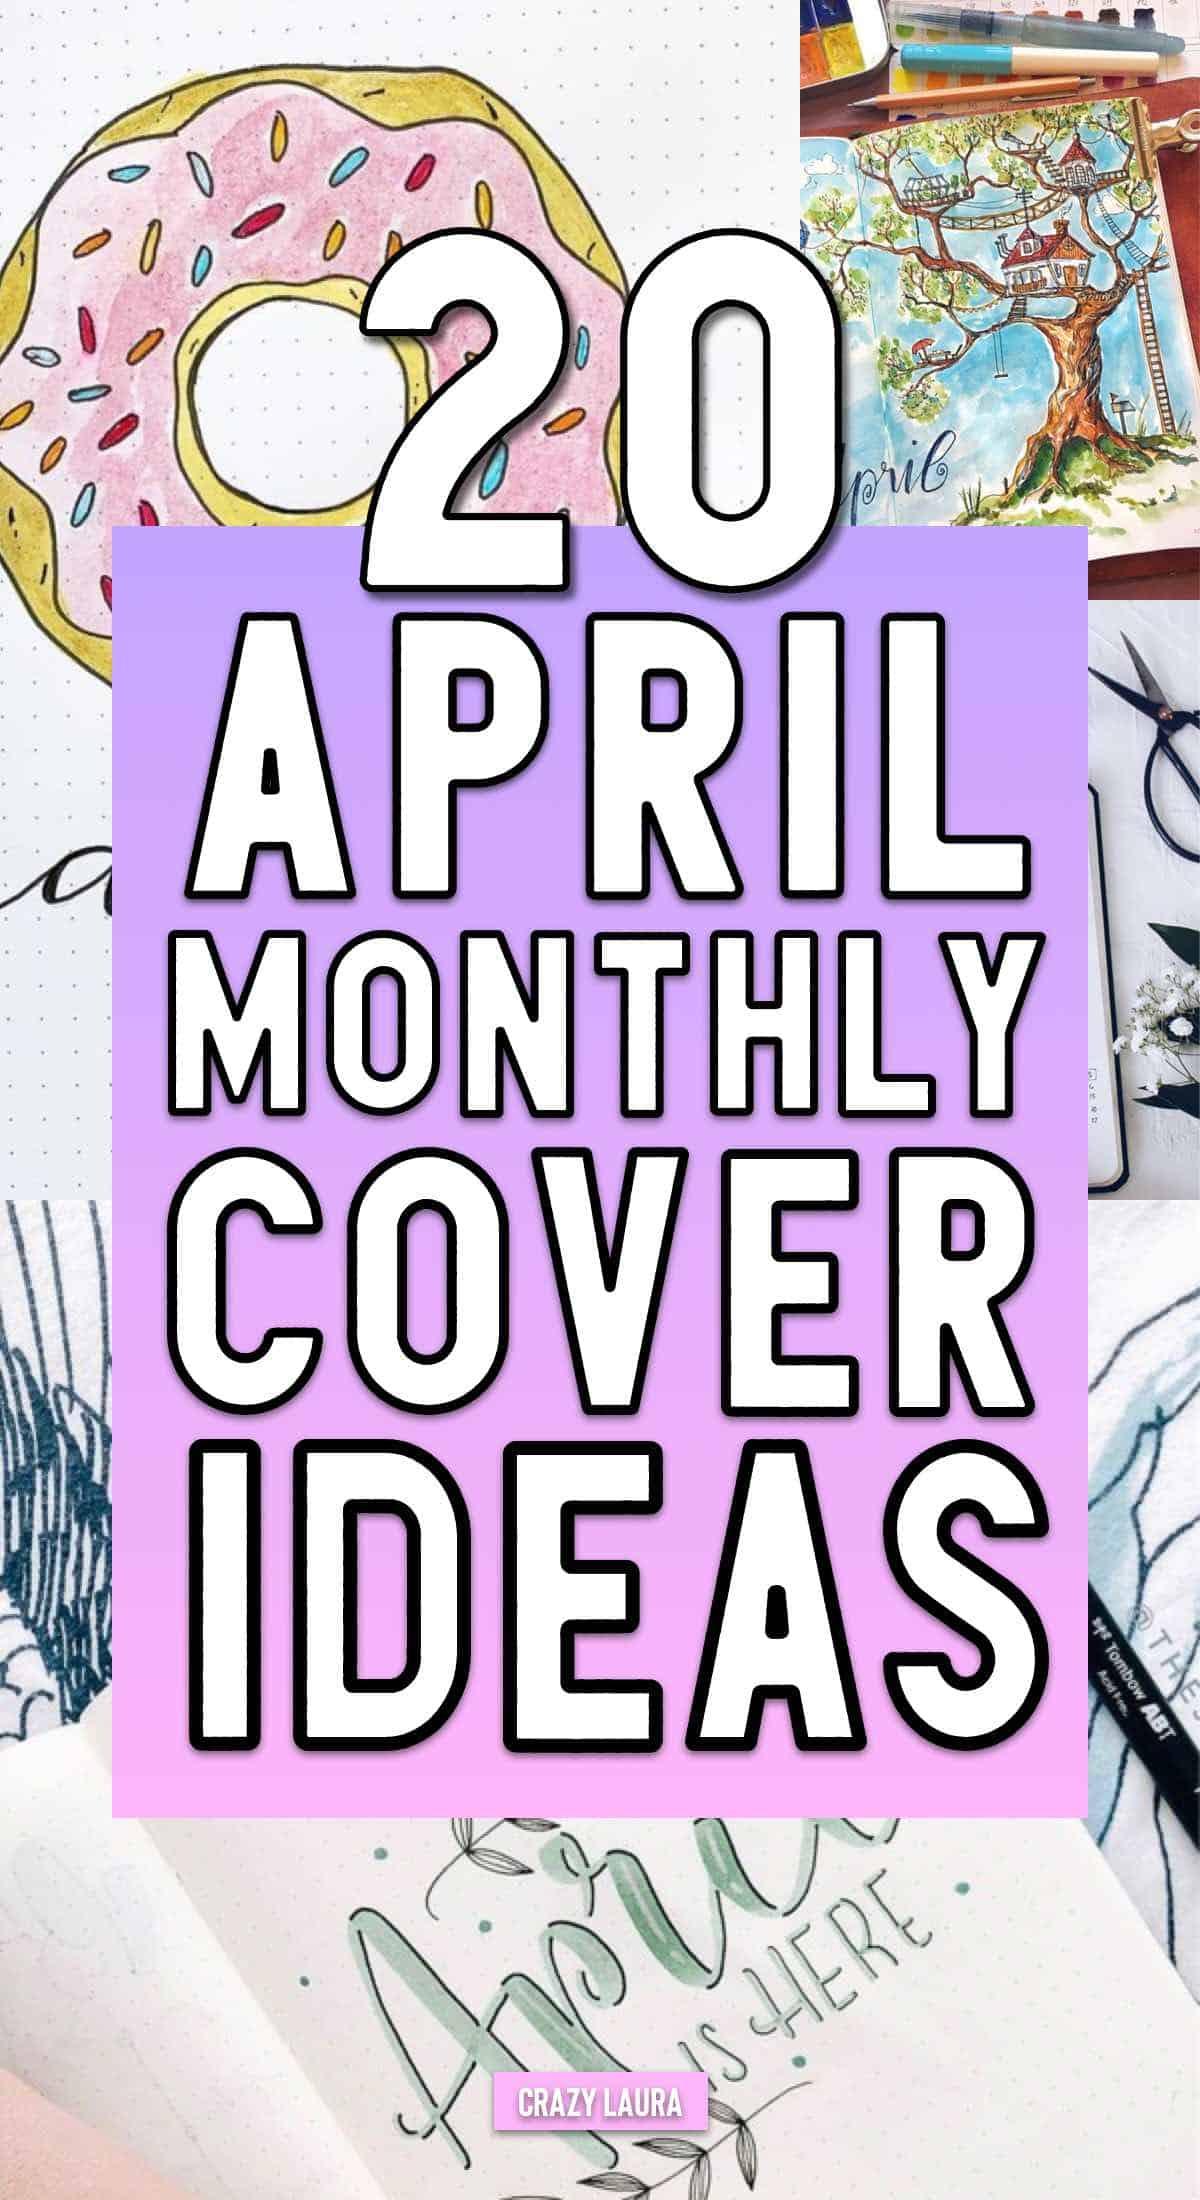 bullet journal cover idea